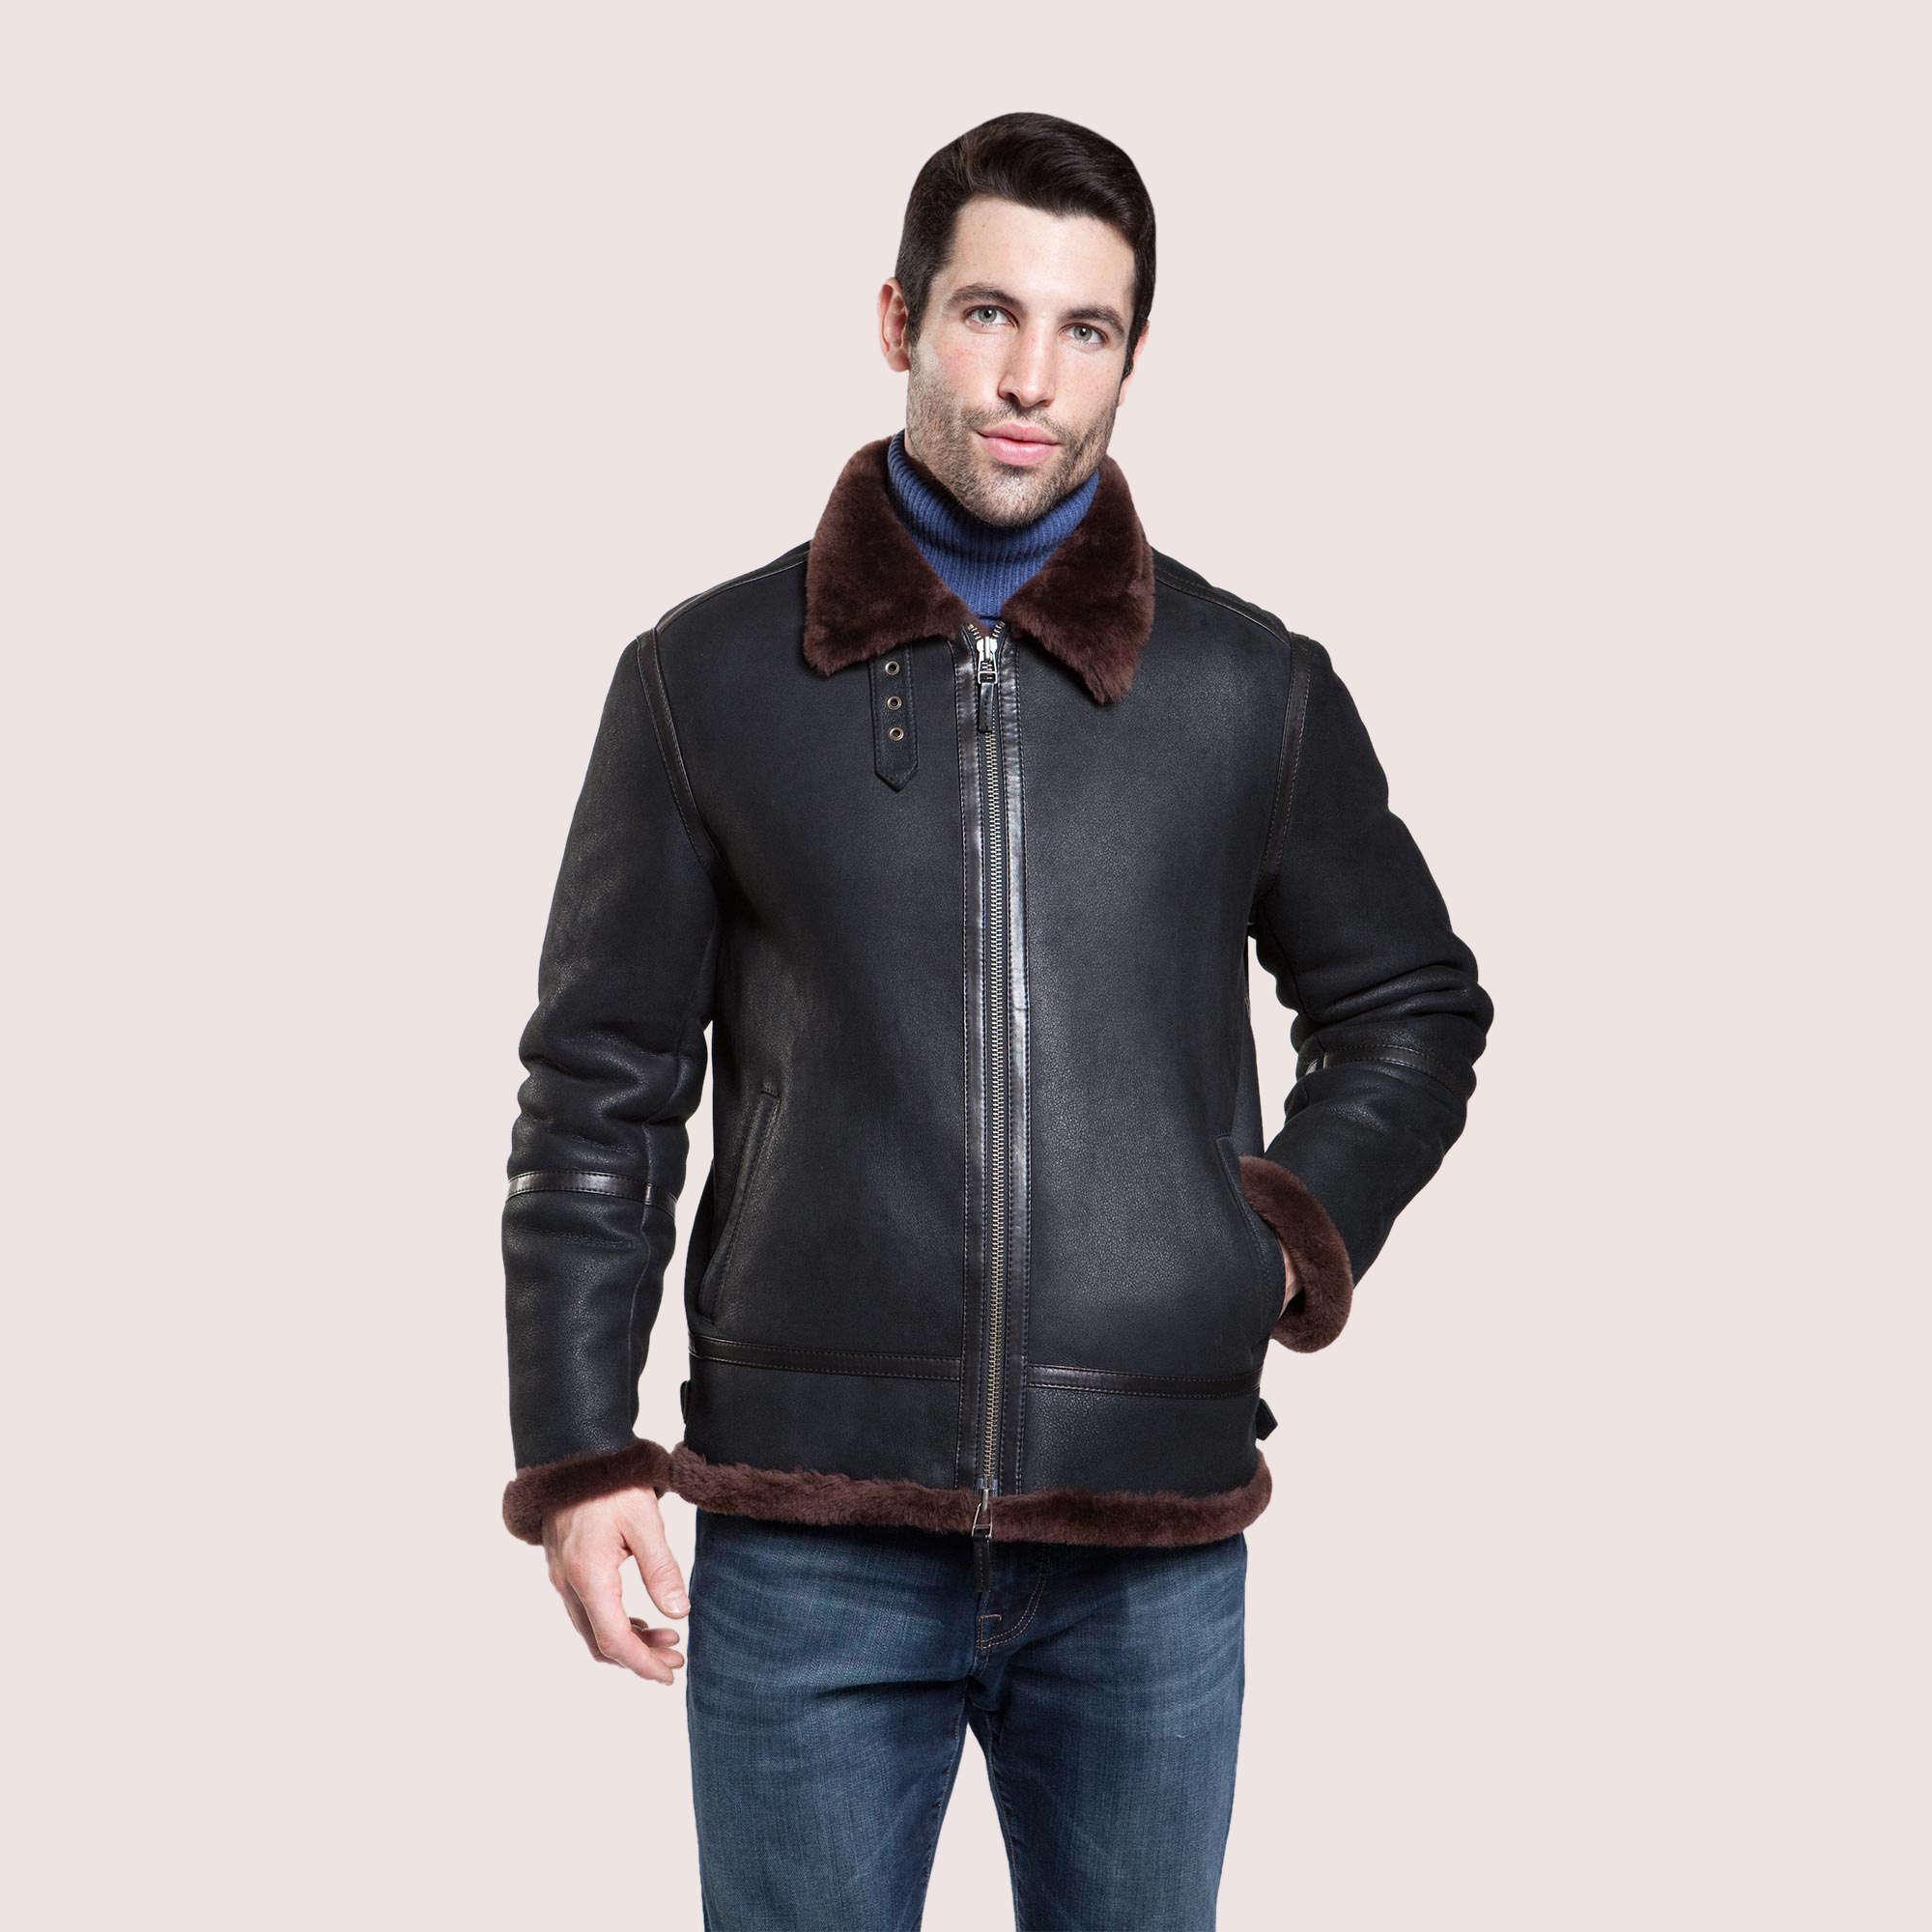 Winfield Shearling Jacket